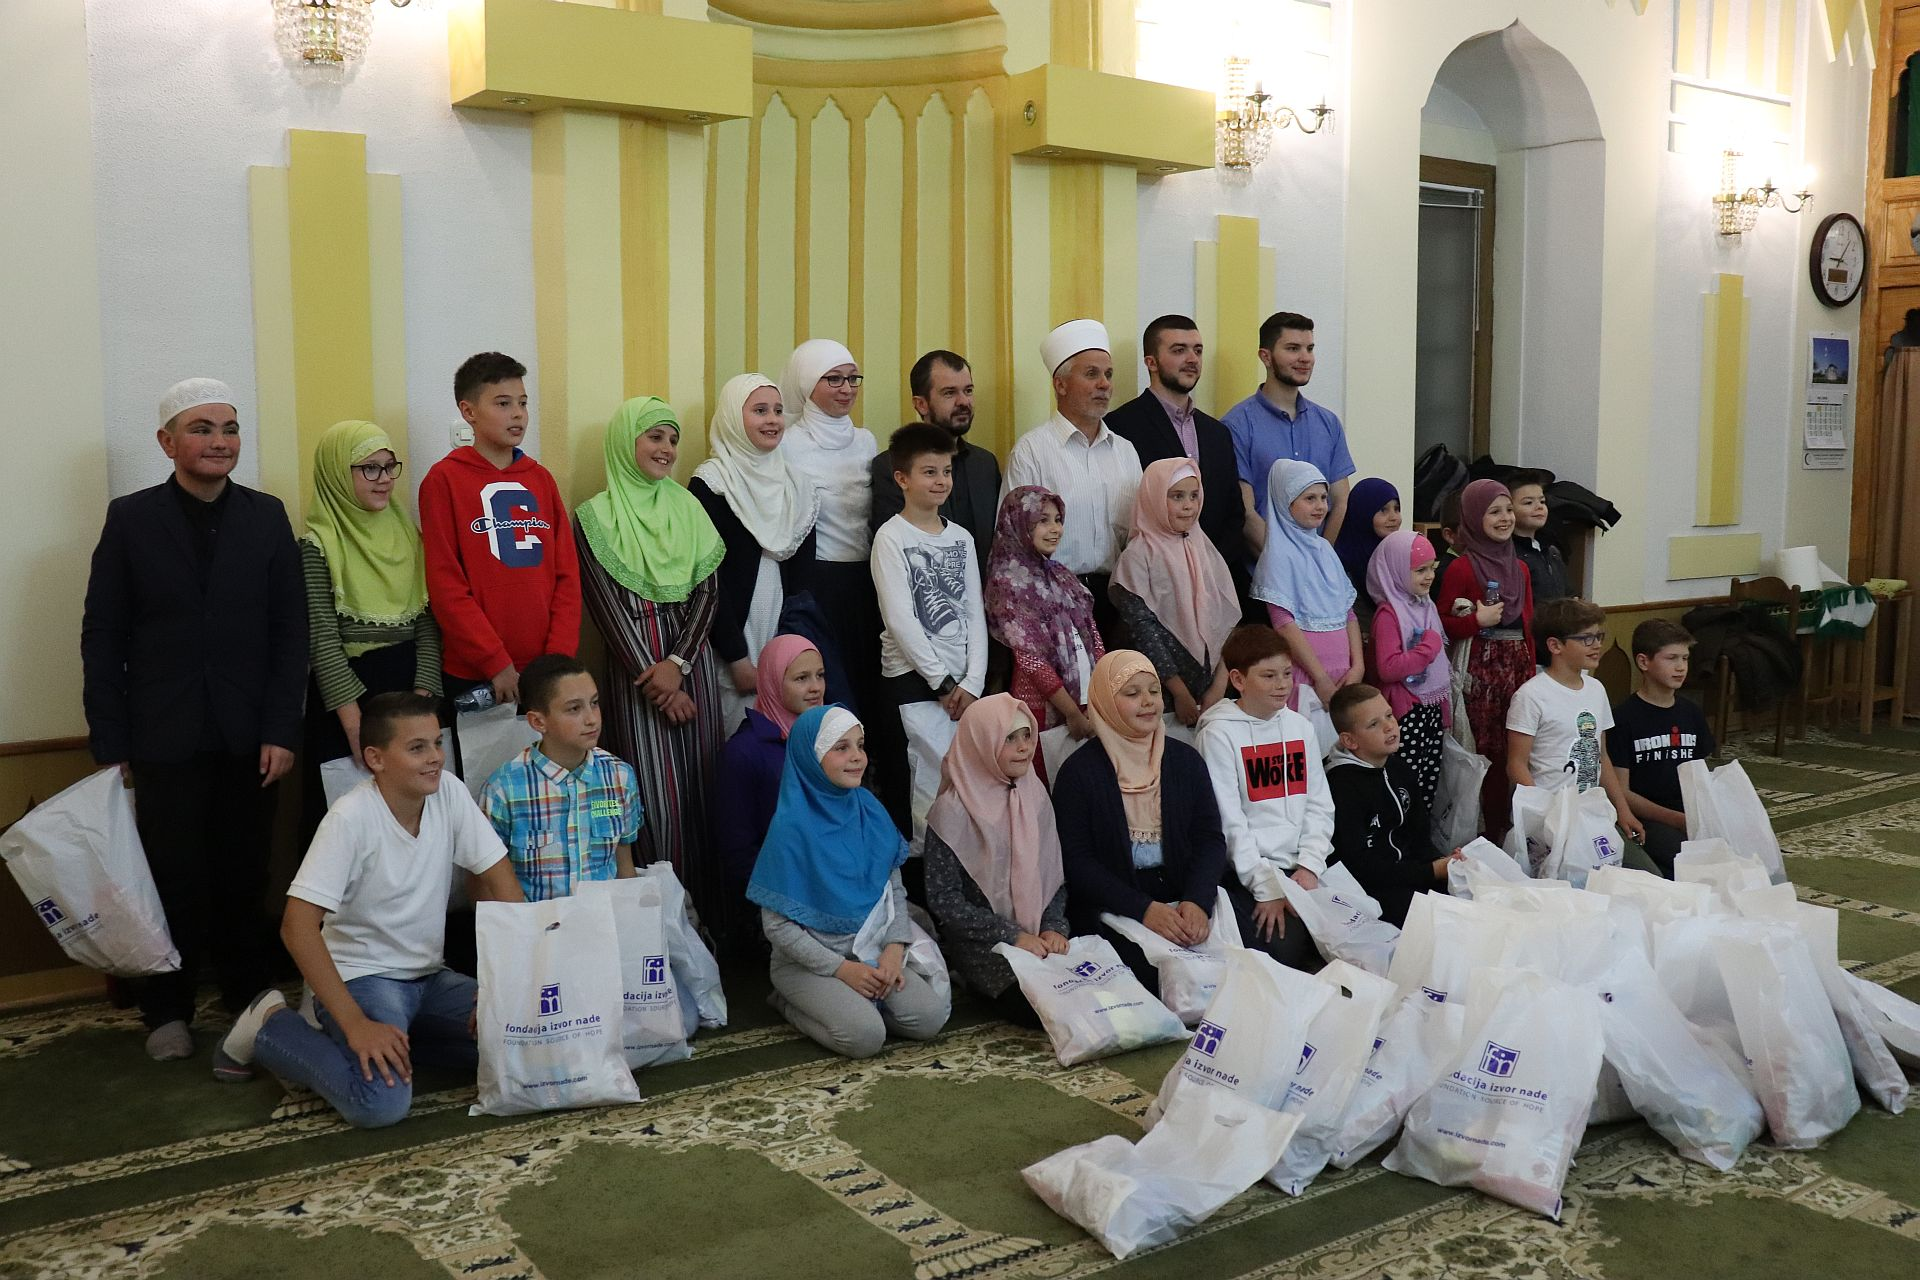 Iftar_Orasje_maj 2019.g Fondacija Izvor nade